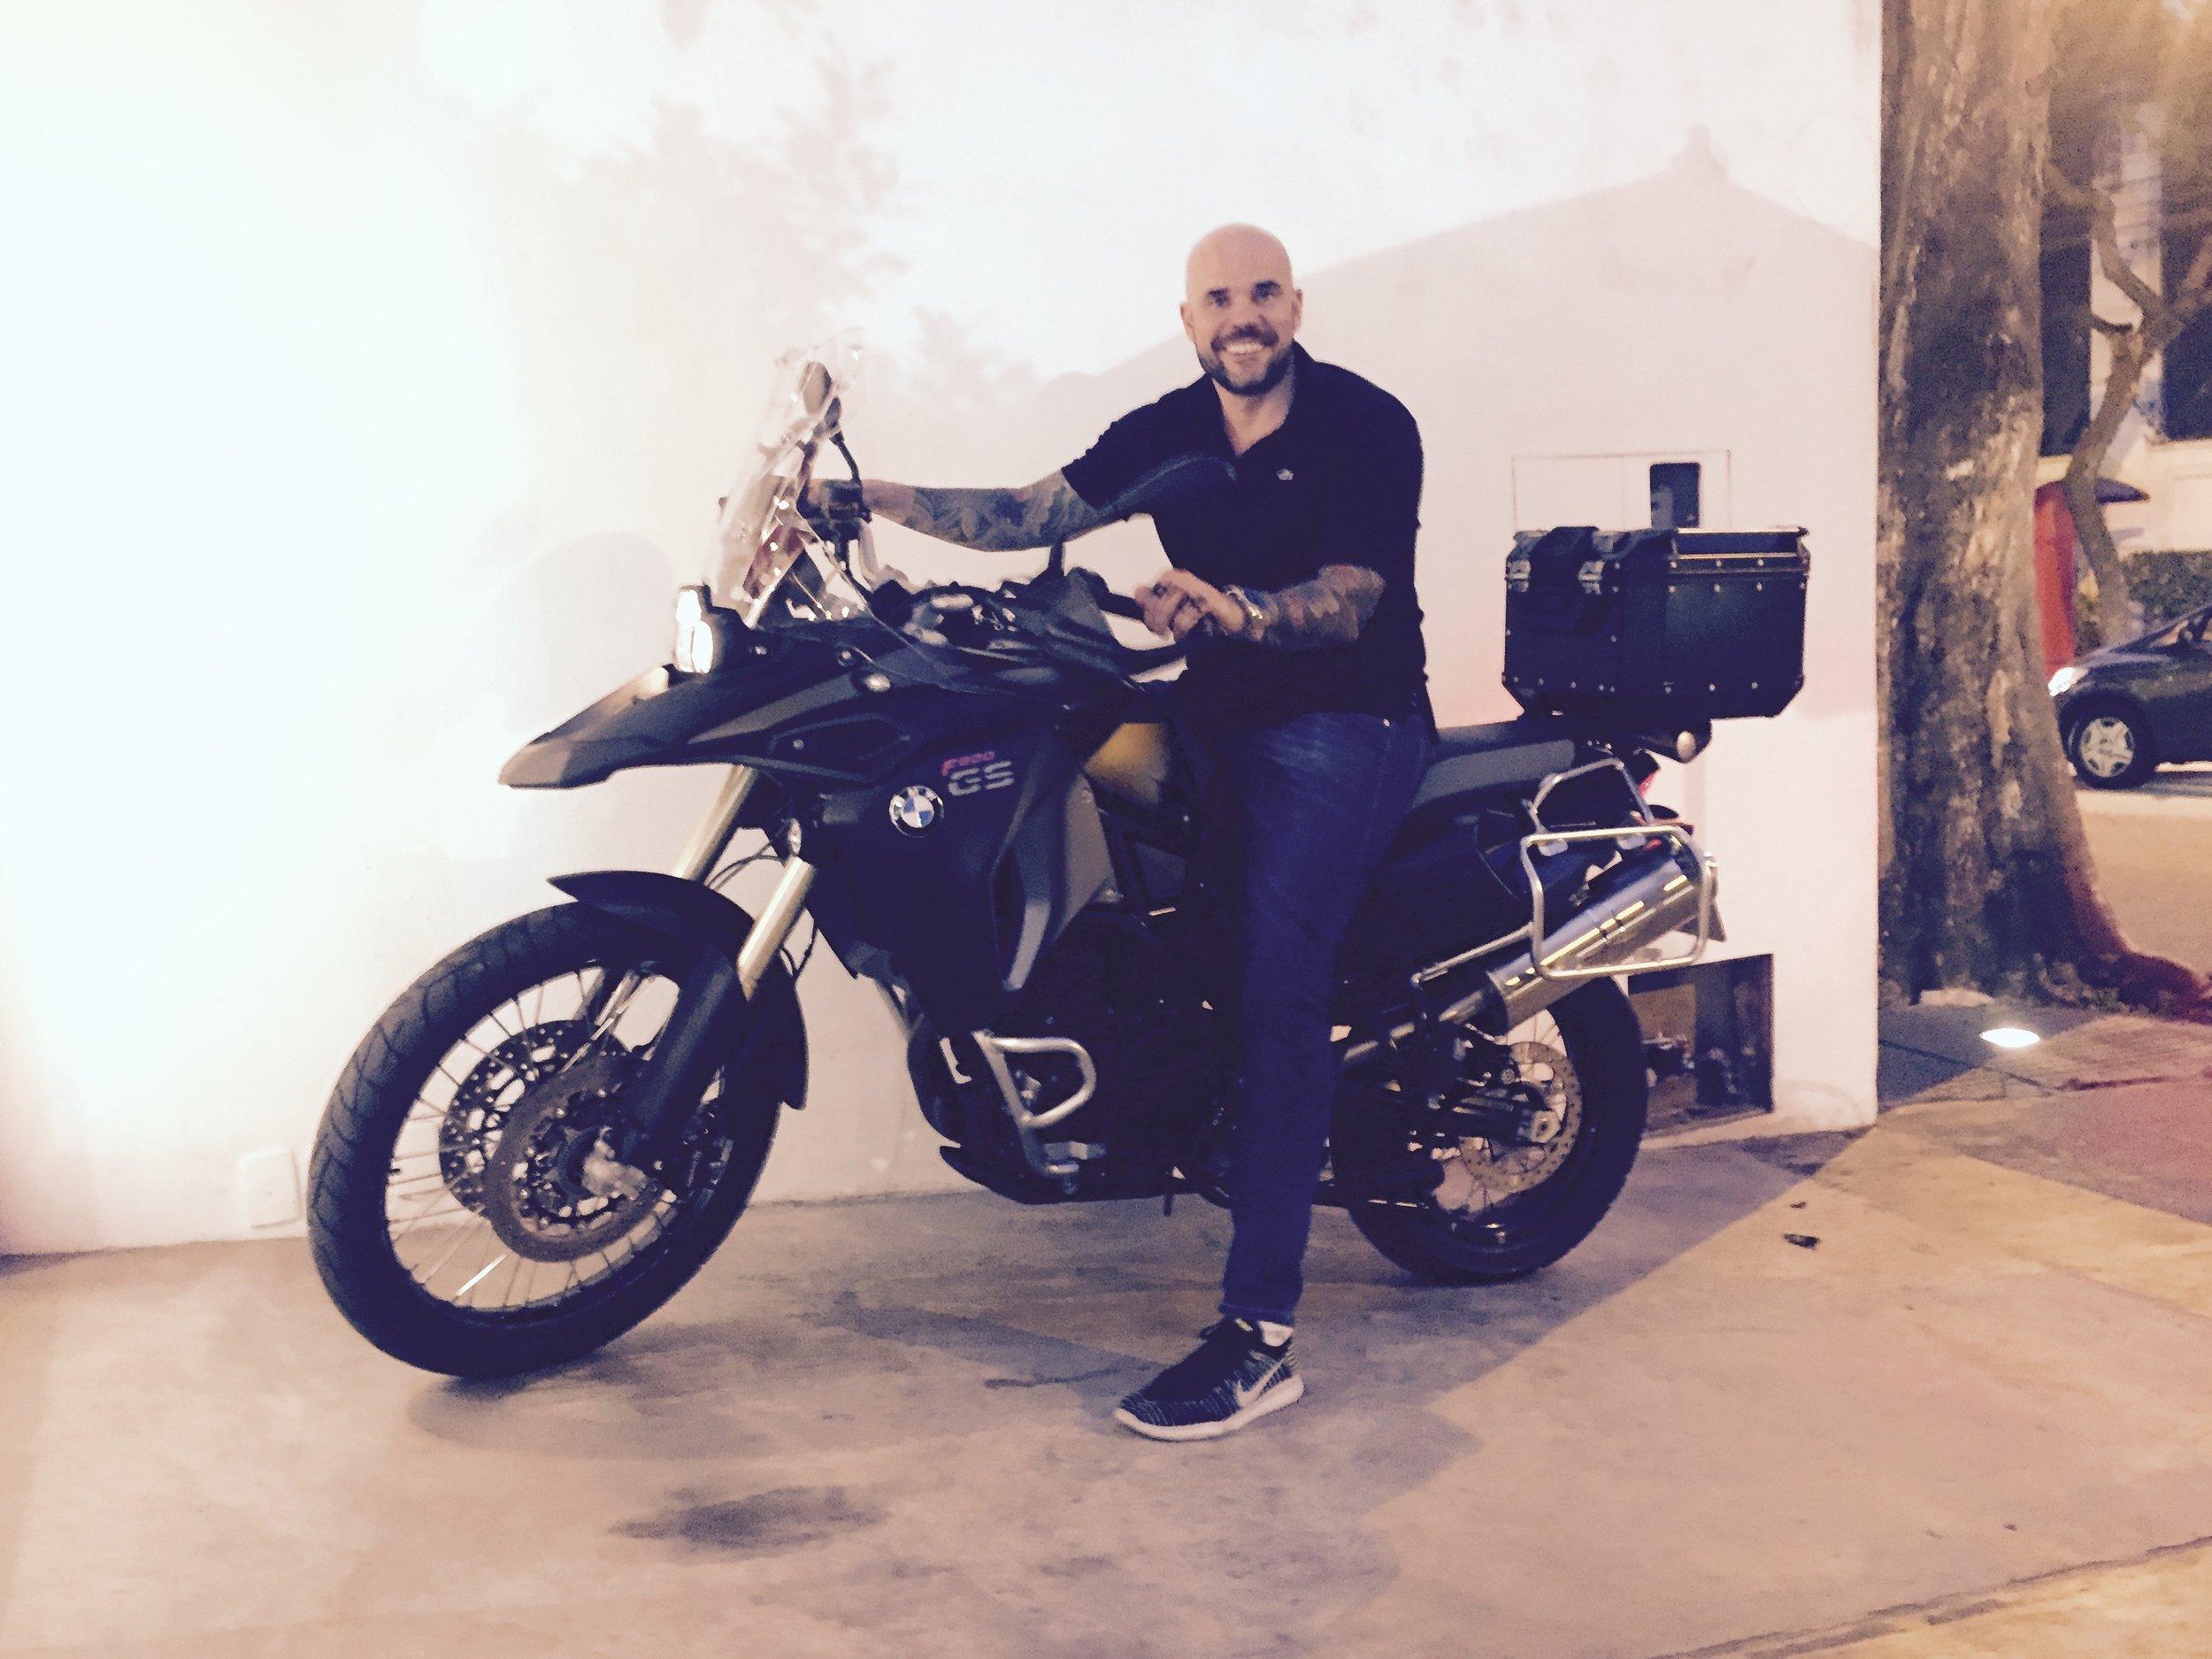 Eduardo on his bike